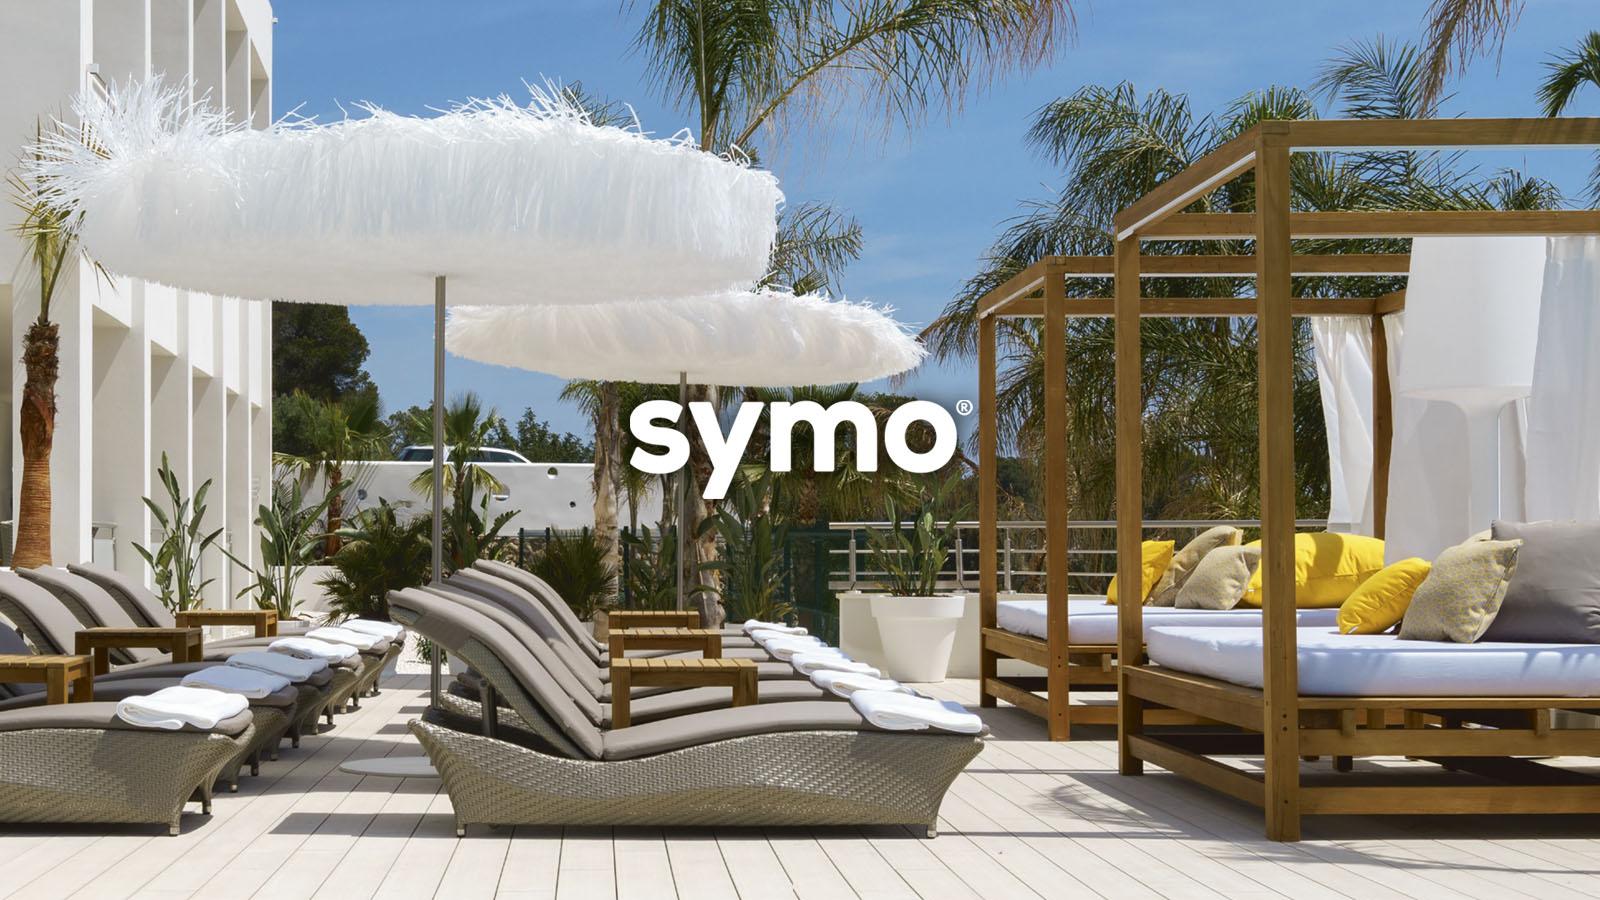 Symo parasol